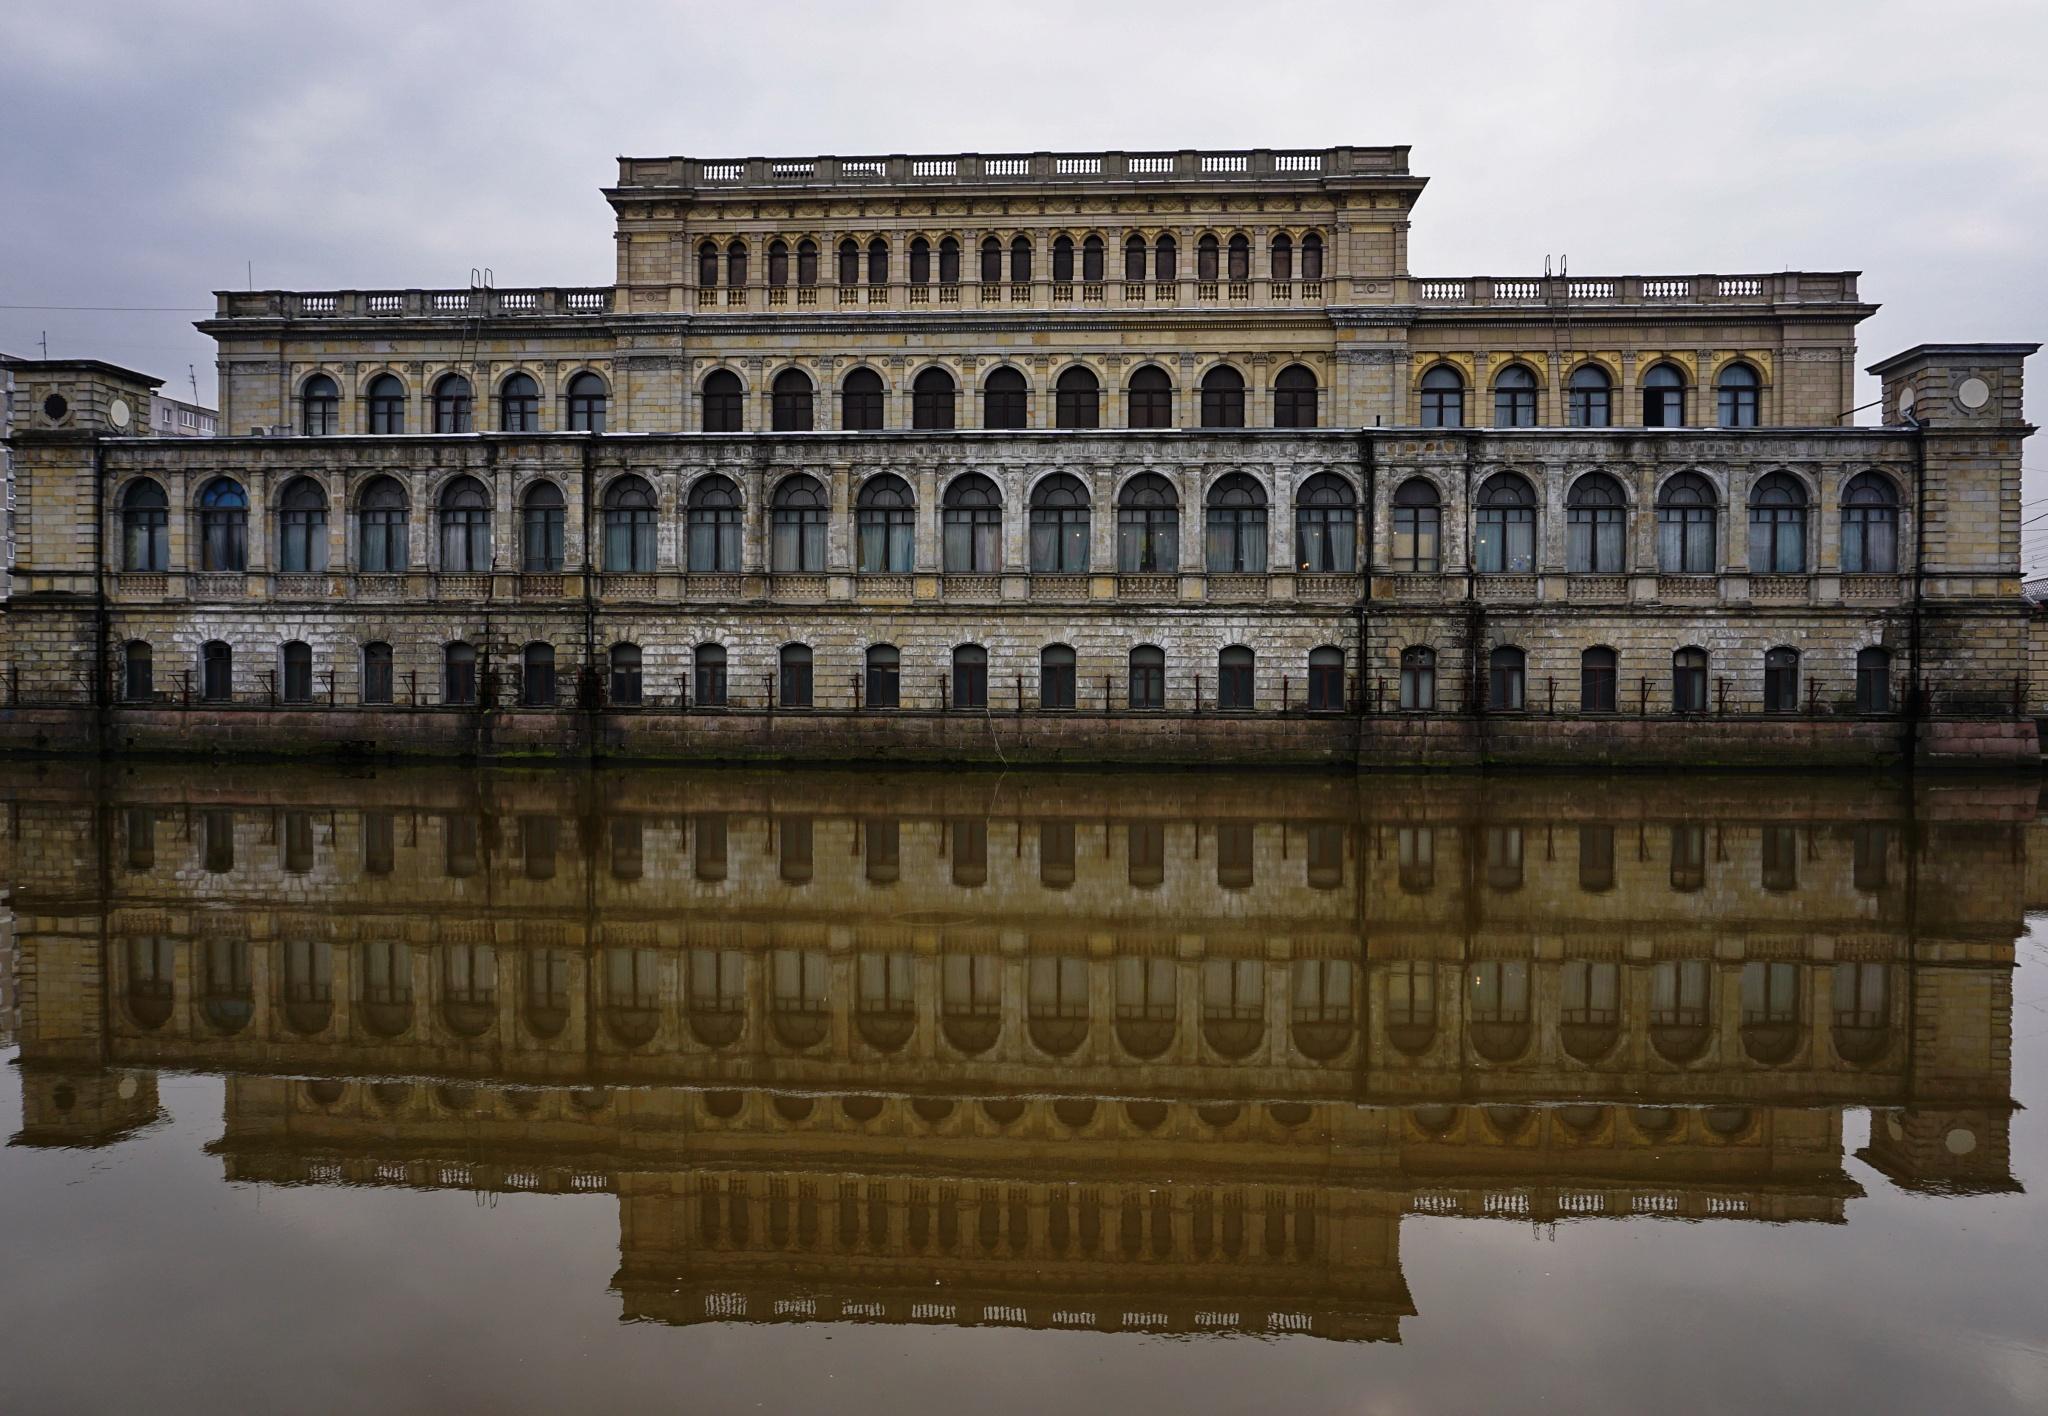 Калининград. by Murat Bukaev